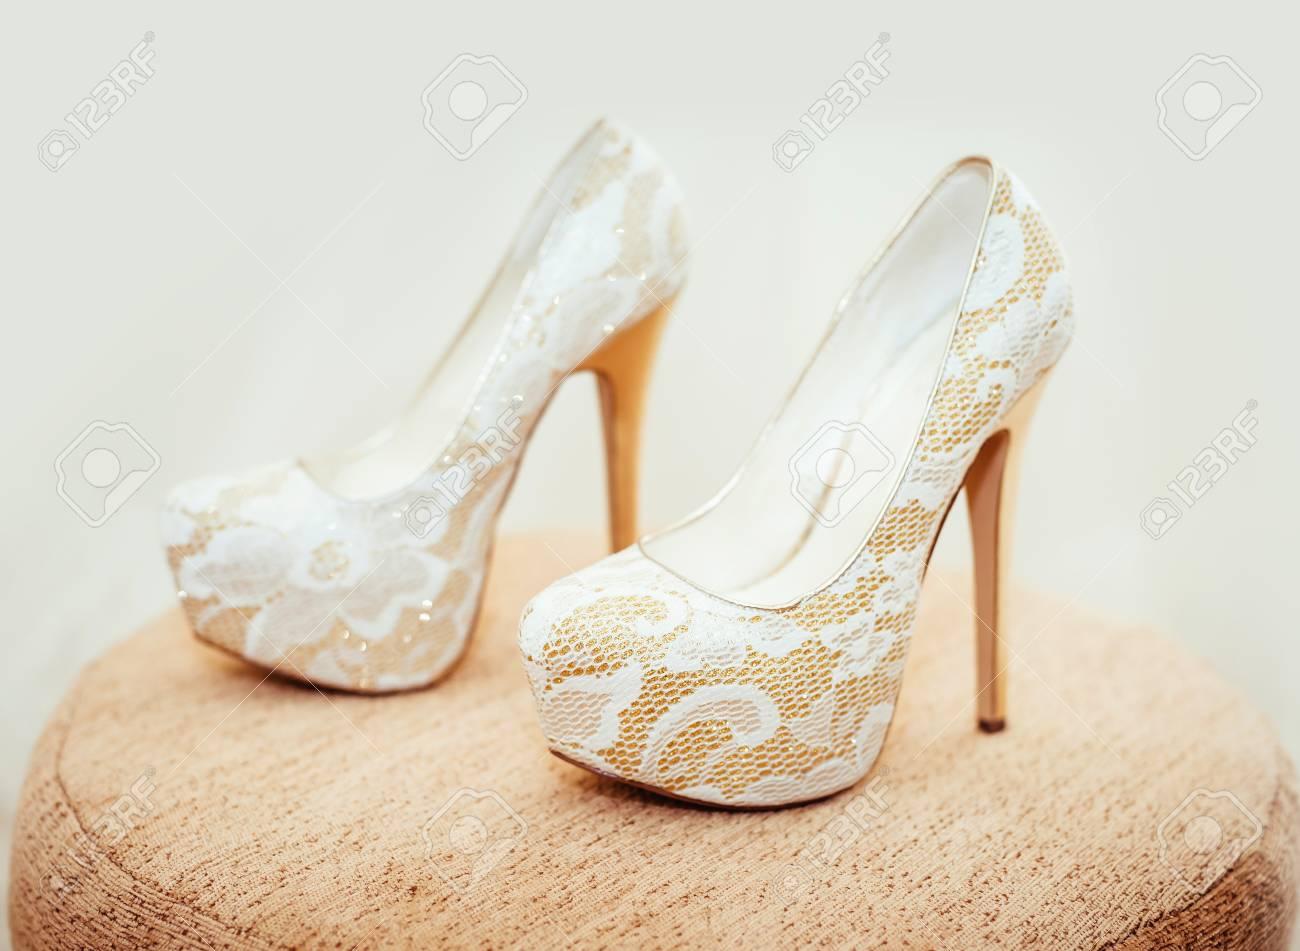 White Shoe Of The Bride . Wedding Theme Background. Stock Photo ...